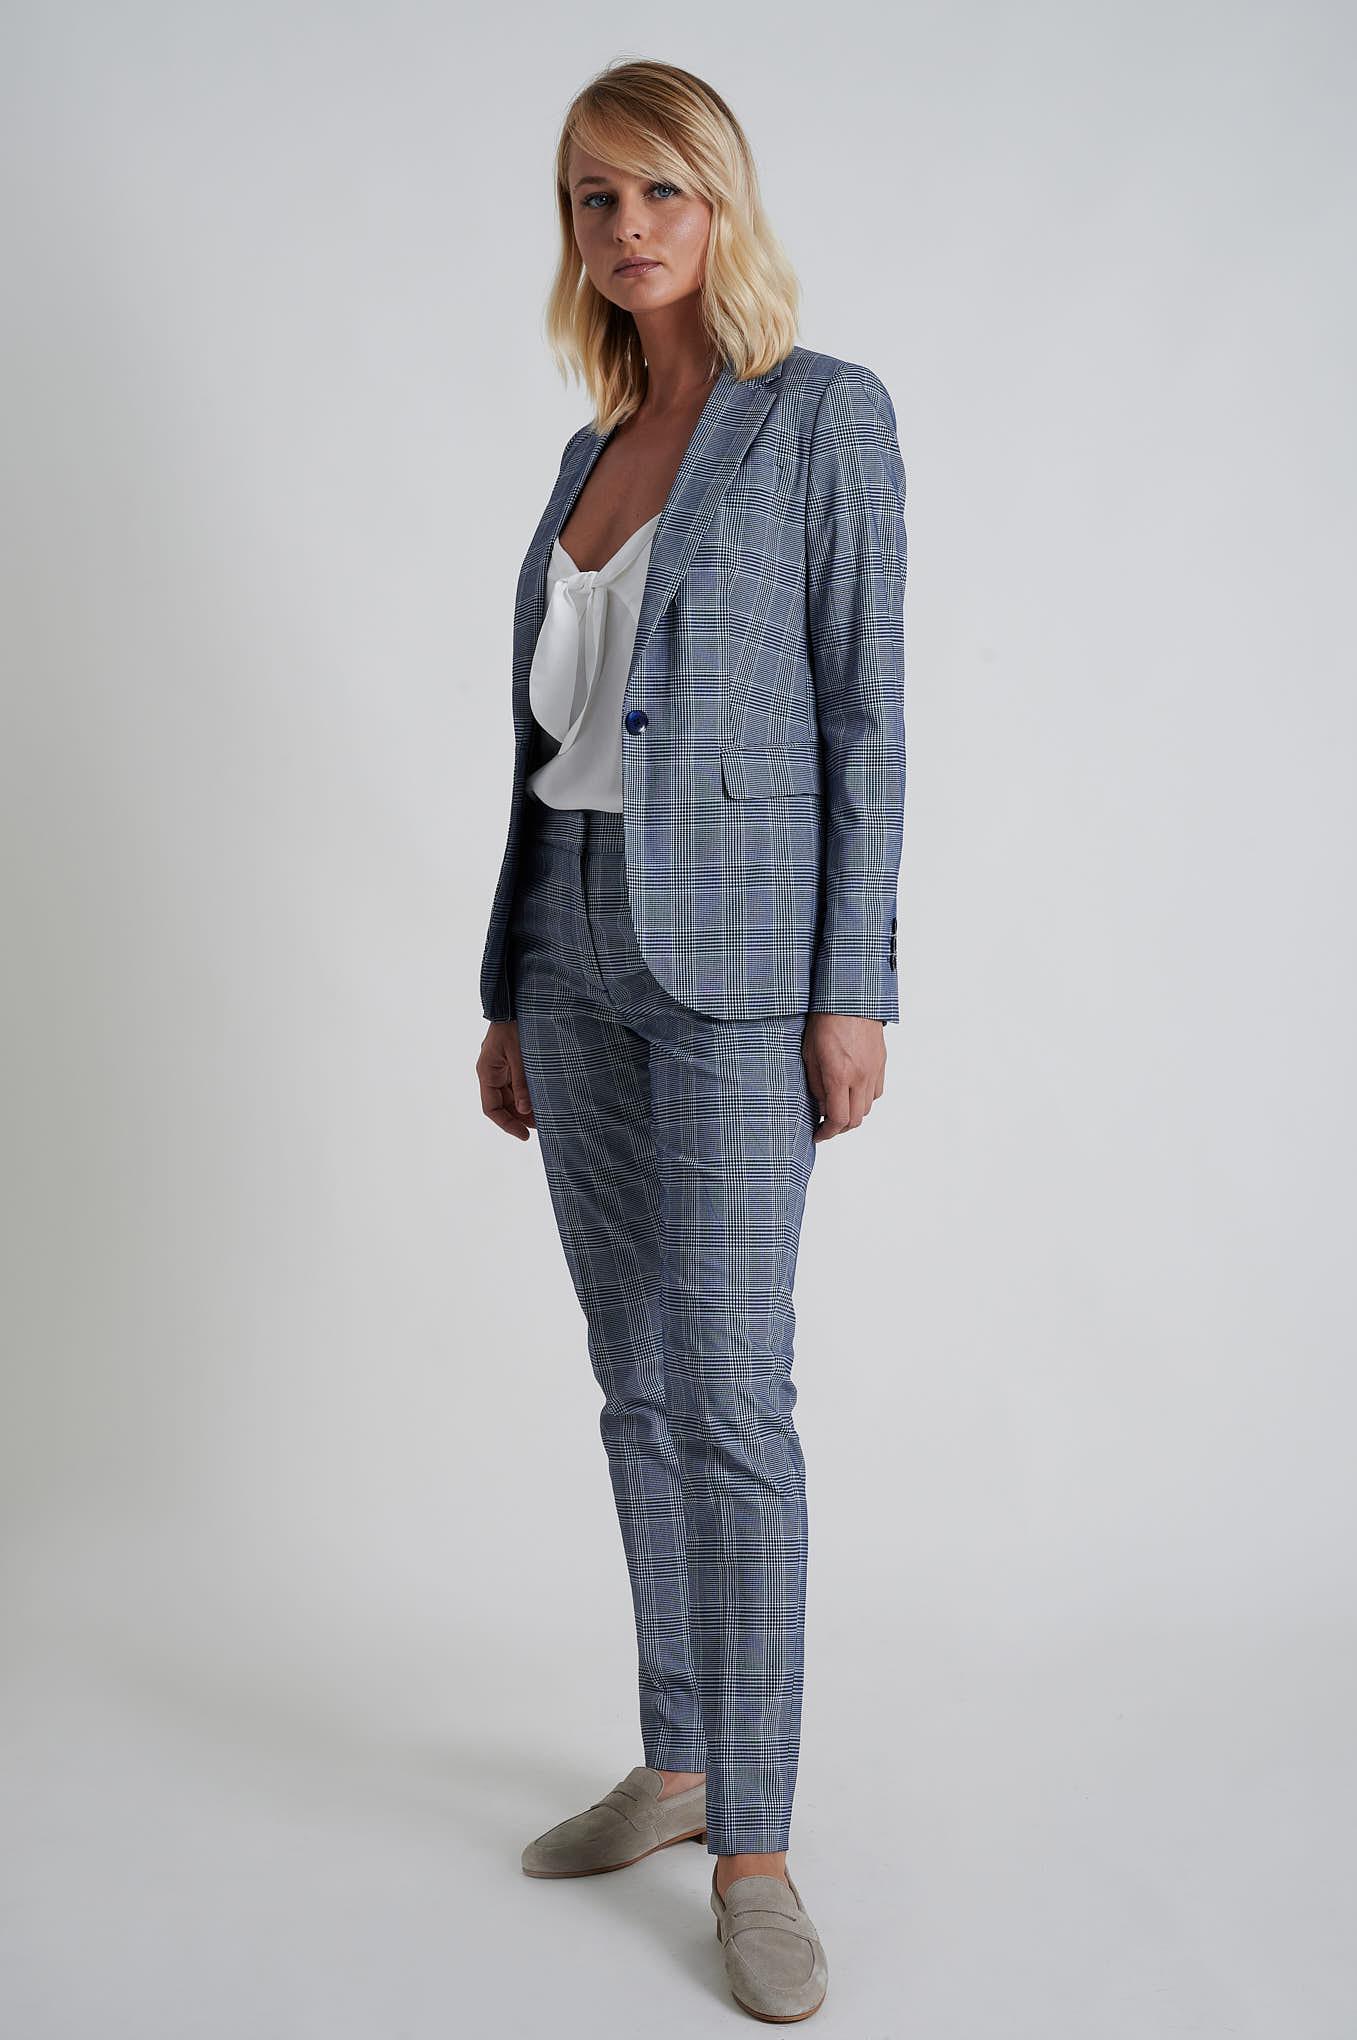 Suit Dark Blue Formal Woman